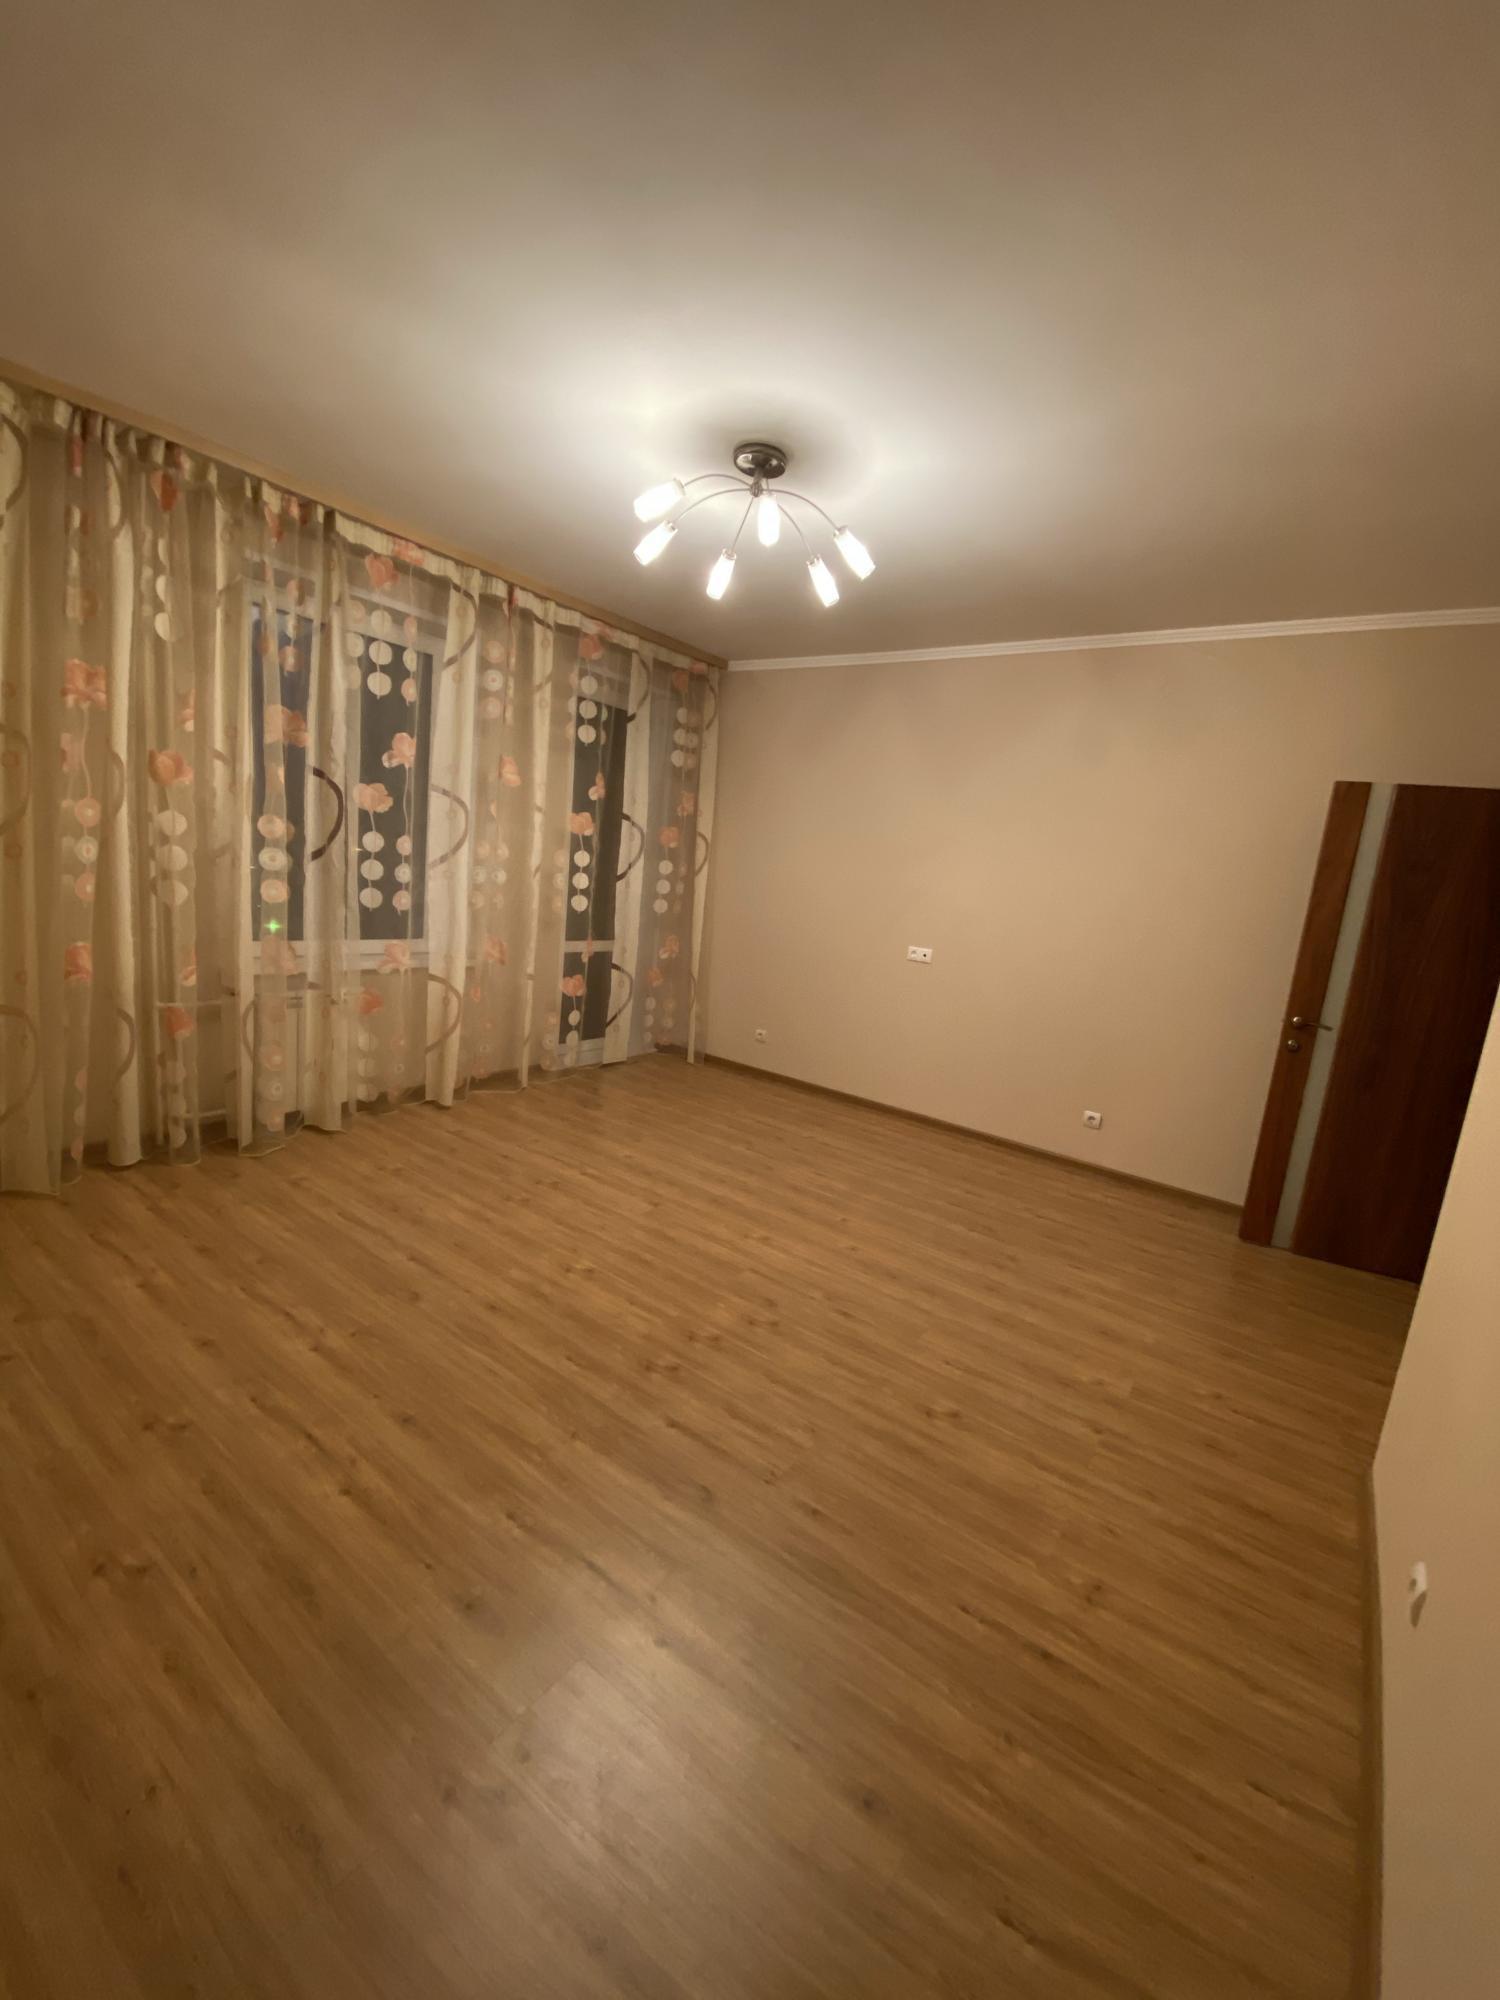 2к квартира Капитанская улица, 6 | 30000 | аренда в Красноярске фото 3